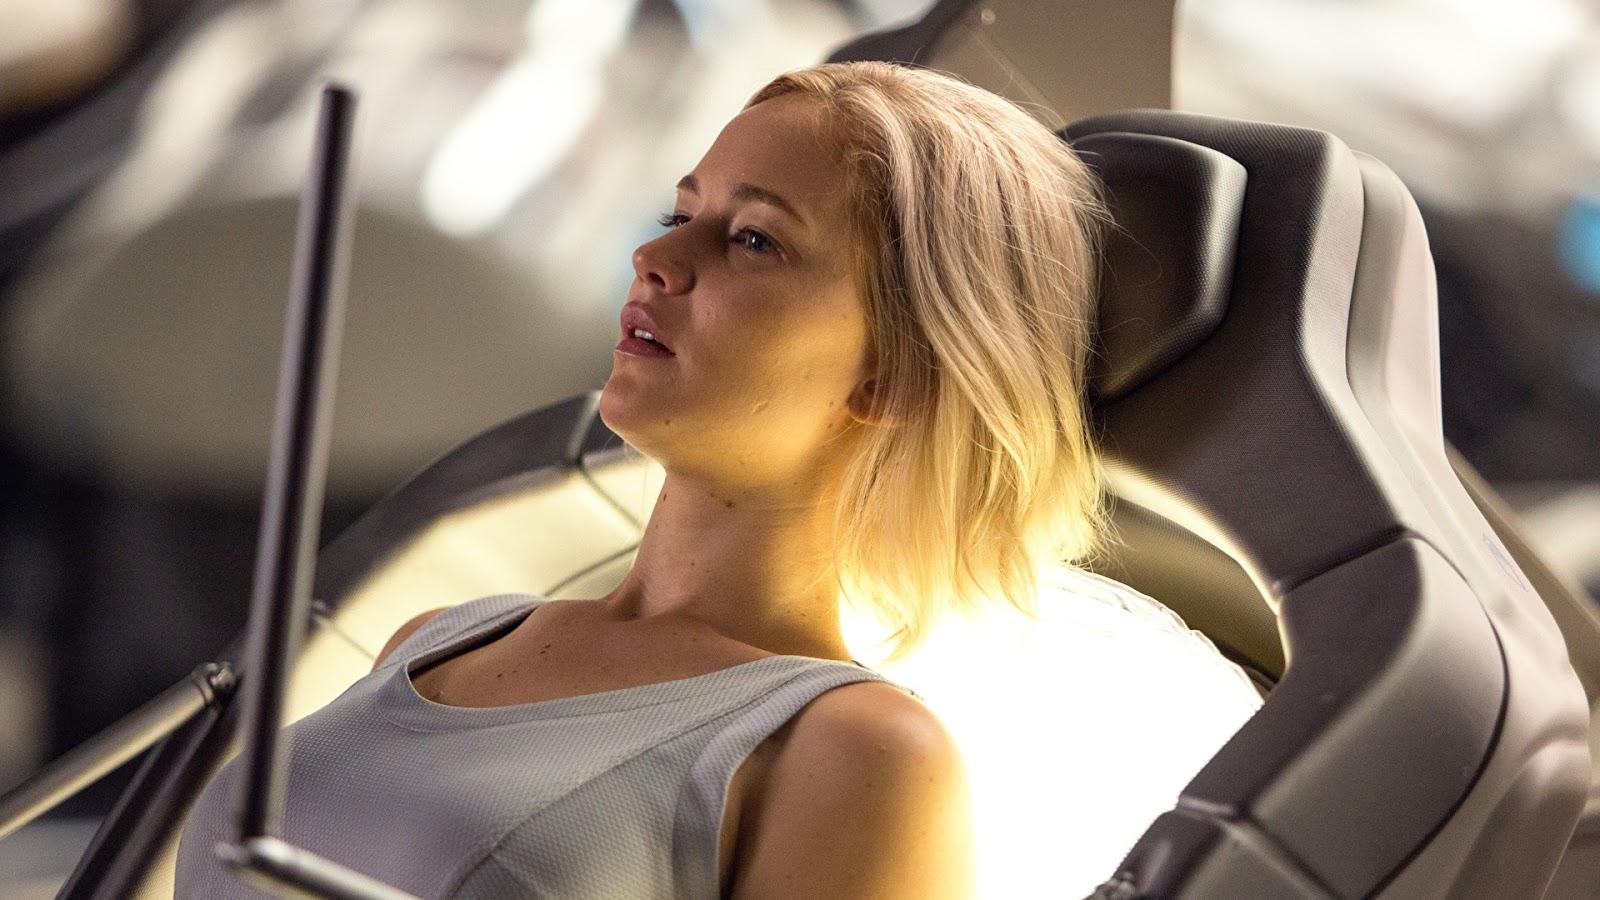 Jennifer Lawrence Passengers